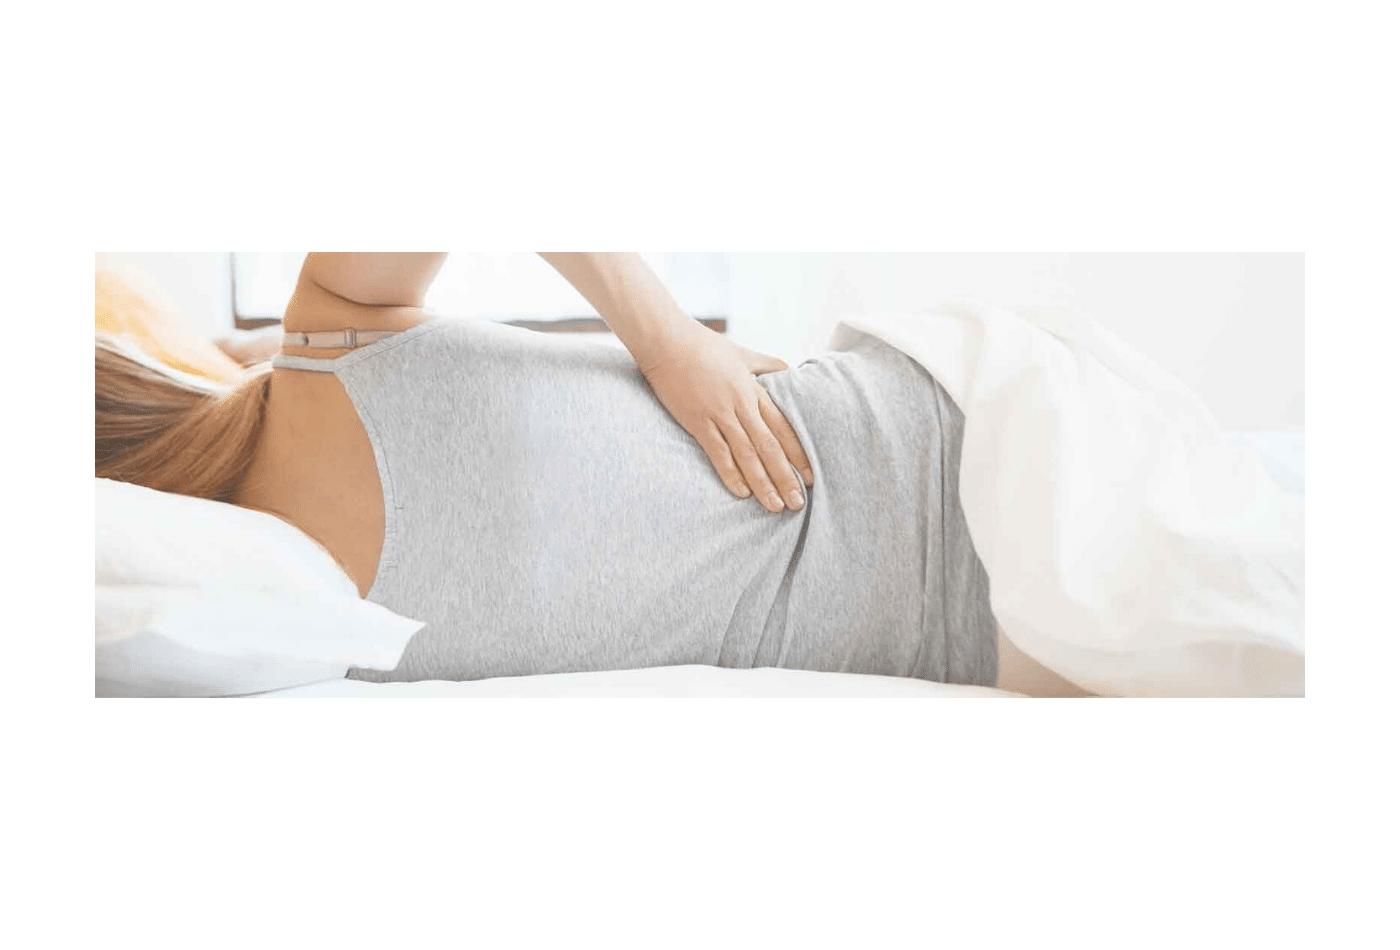 dolore-nervo-sciatico-sciatalgia